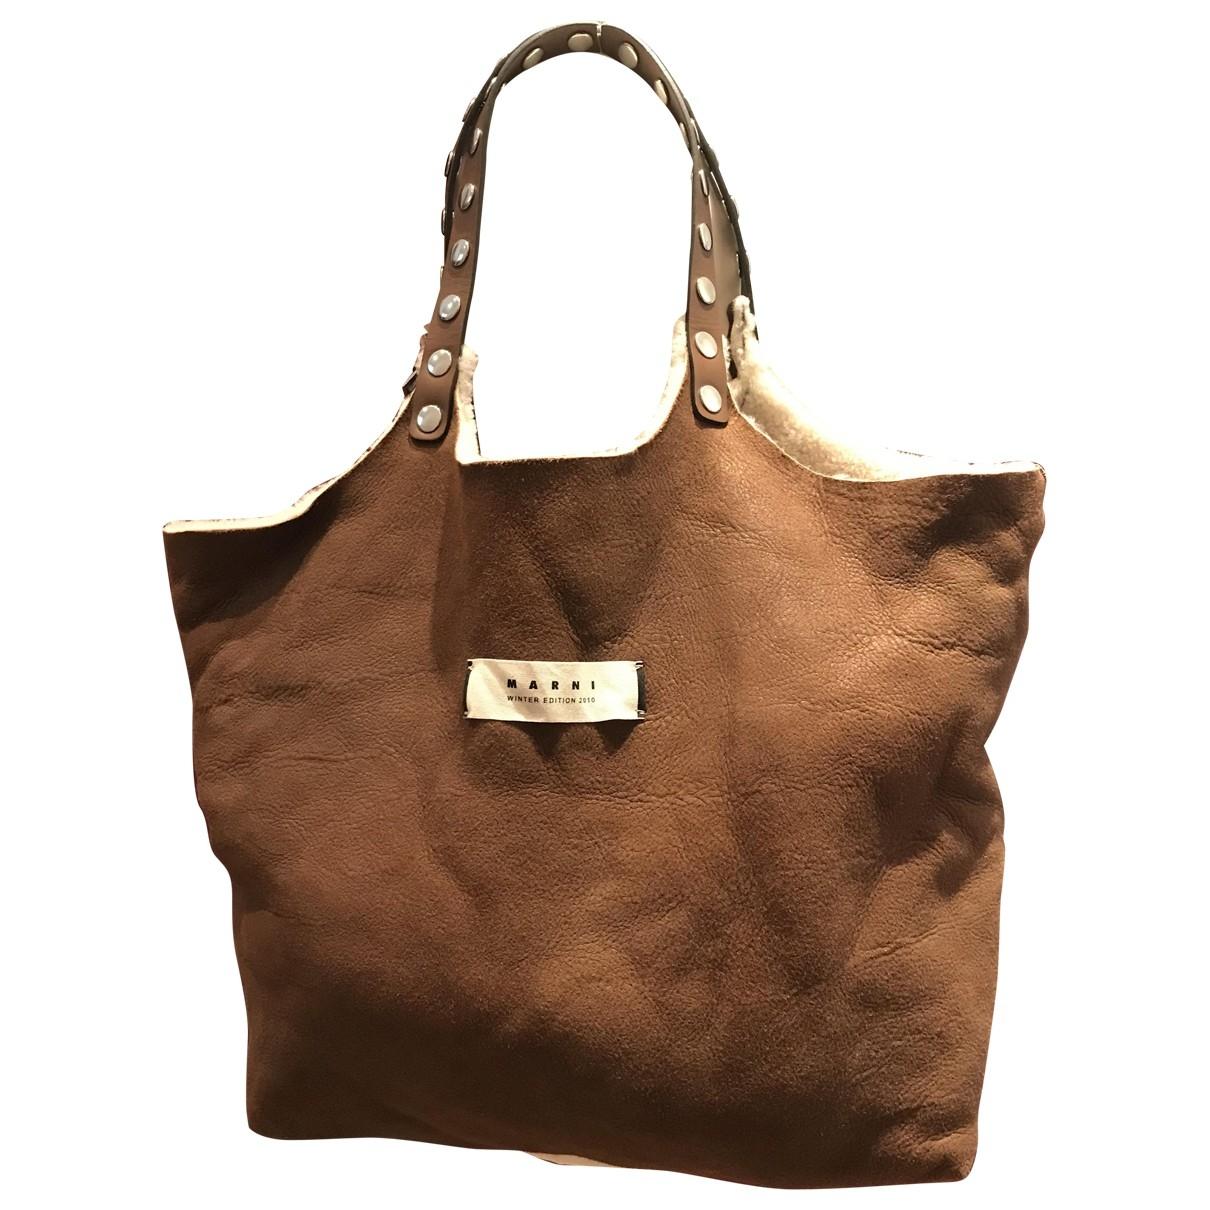 Marni \N Camel Leather handbag for Women \N